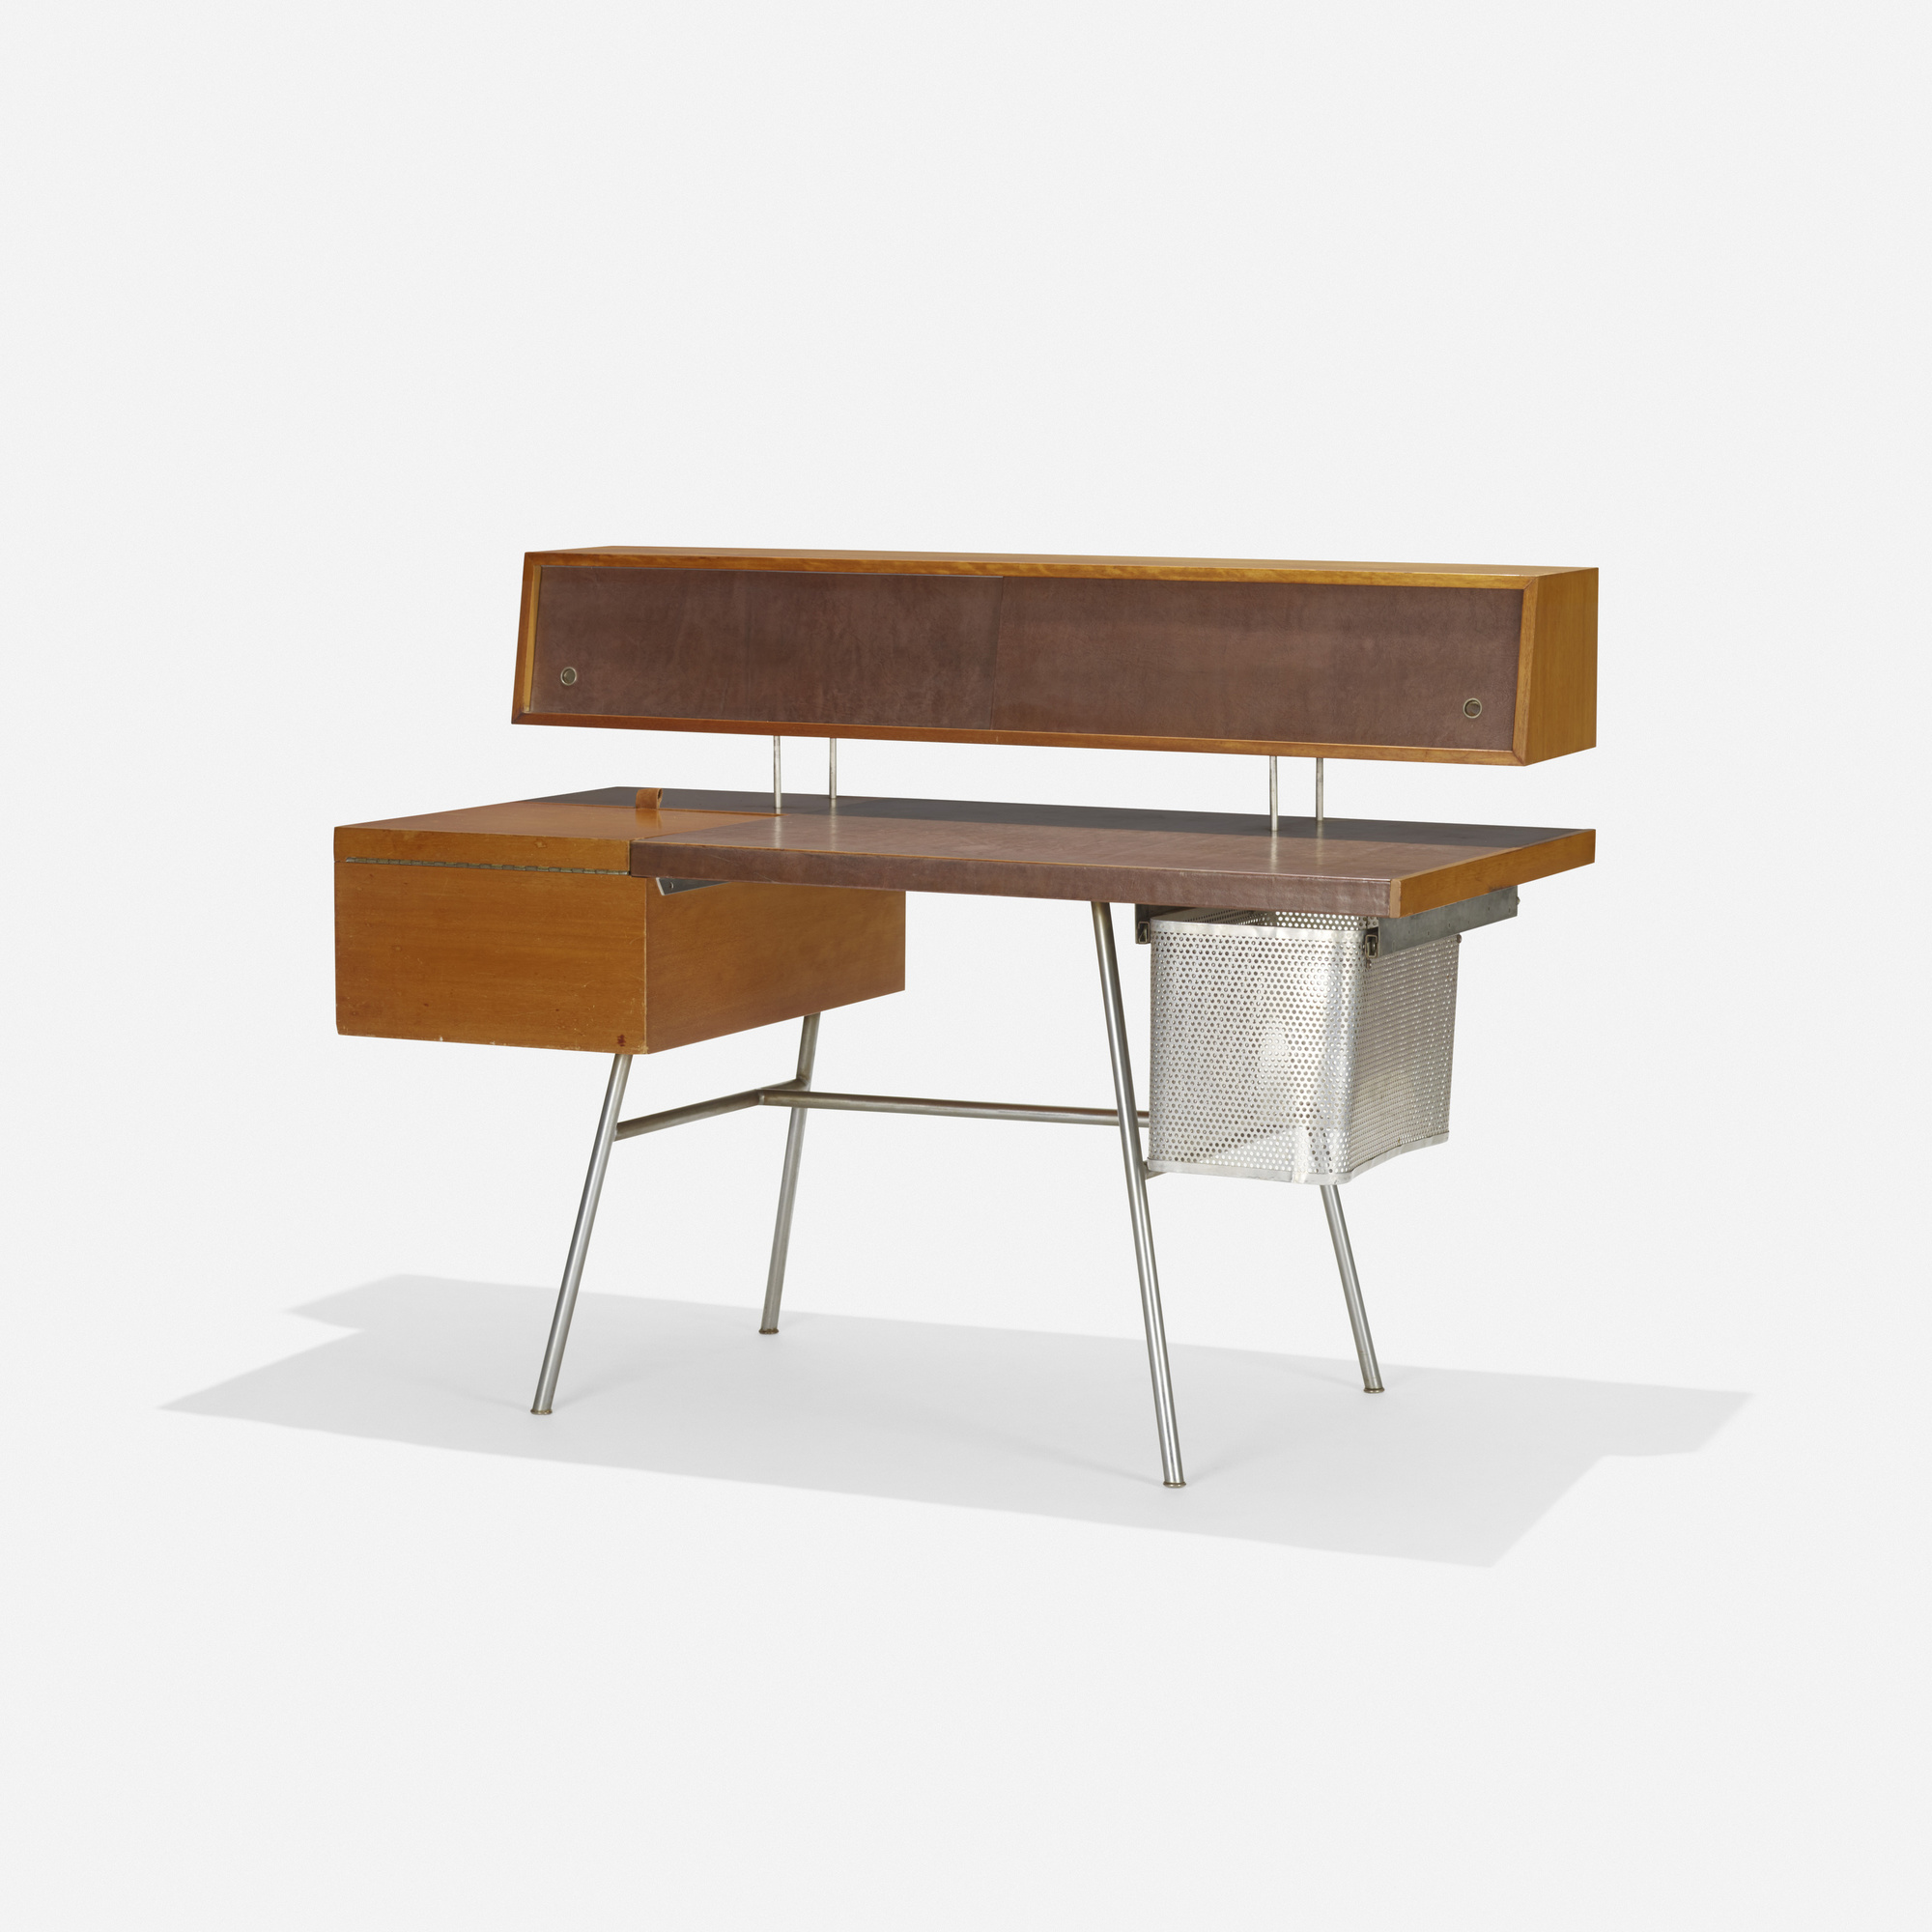 128: GEORGE NELSON & ASSOCIATES, Home Office desk, model 4658 ...